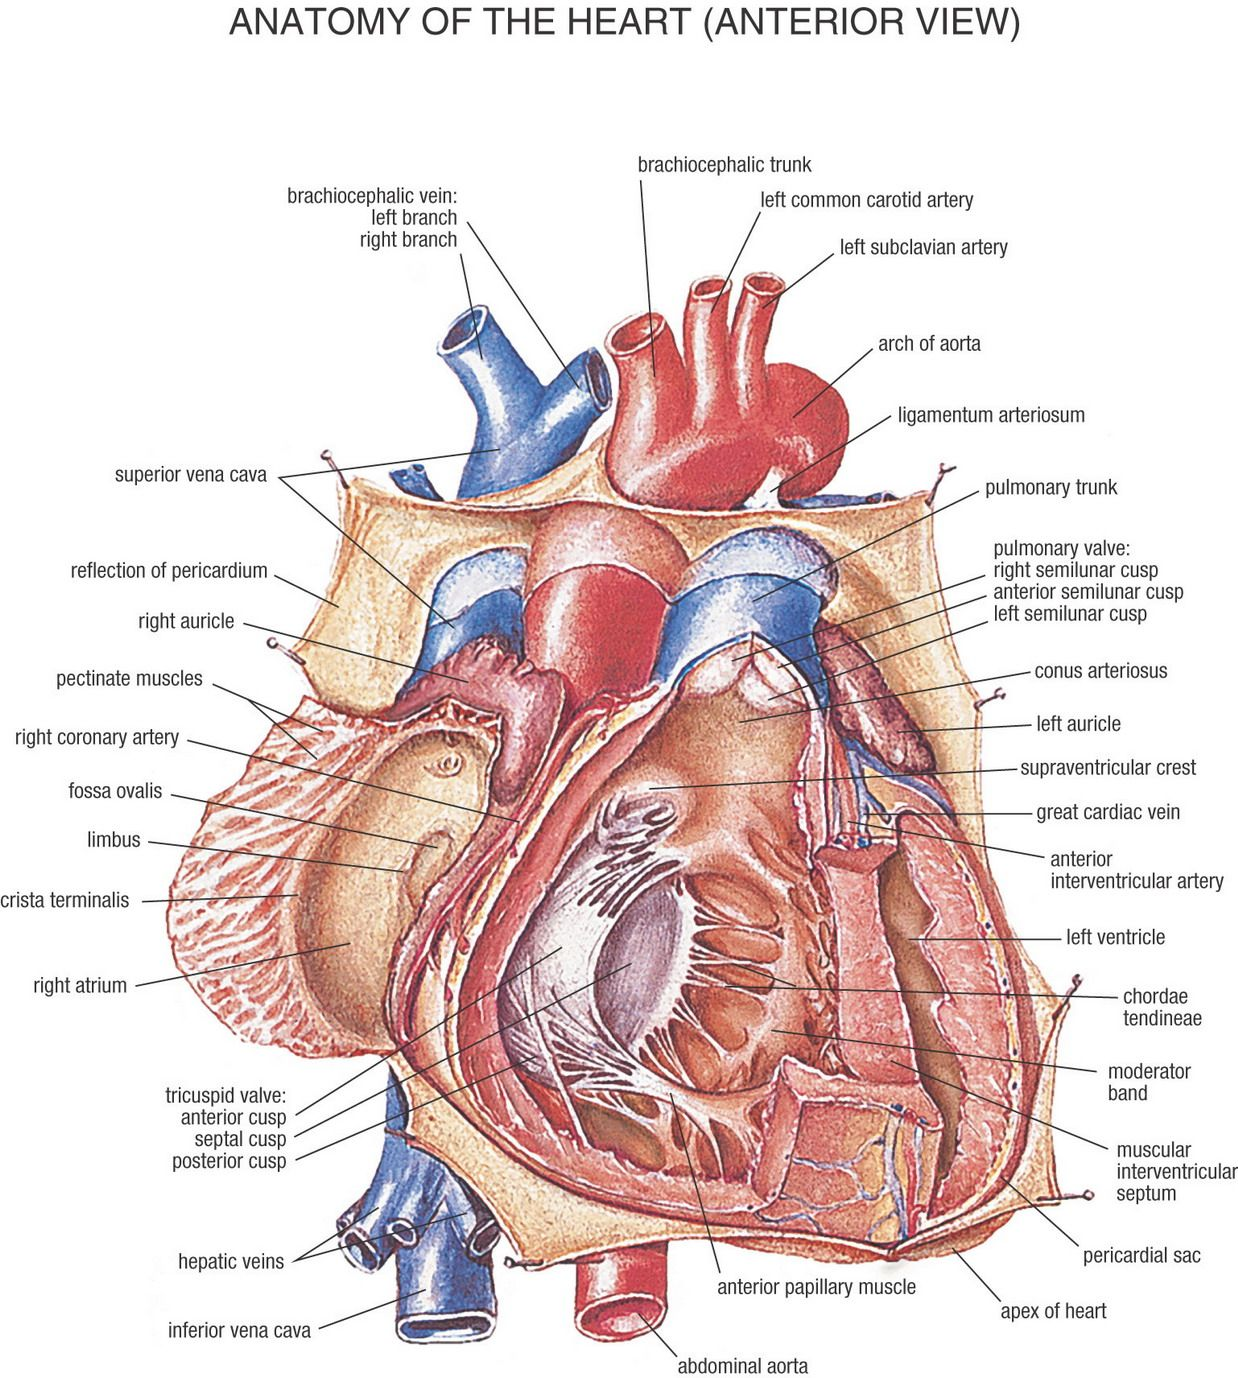 Sistem cardiovascular | General Knowledge of Anatomy of ...